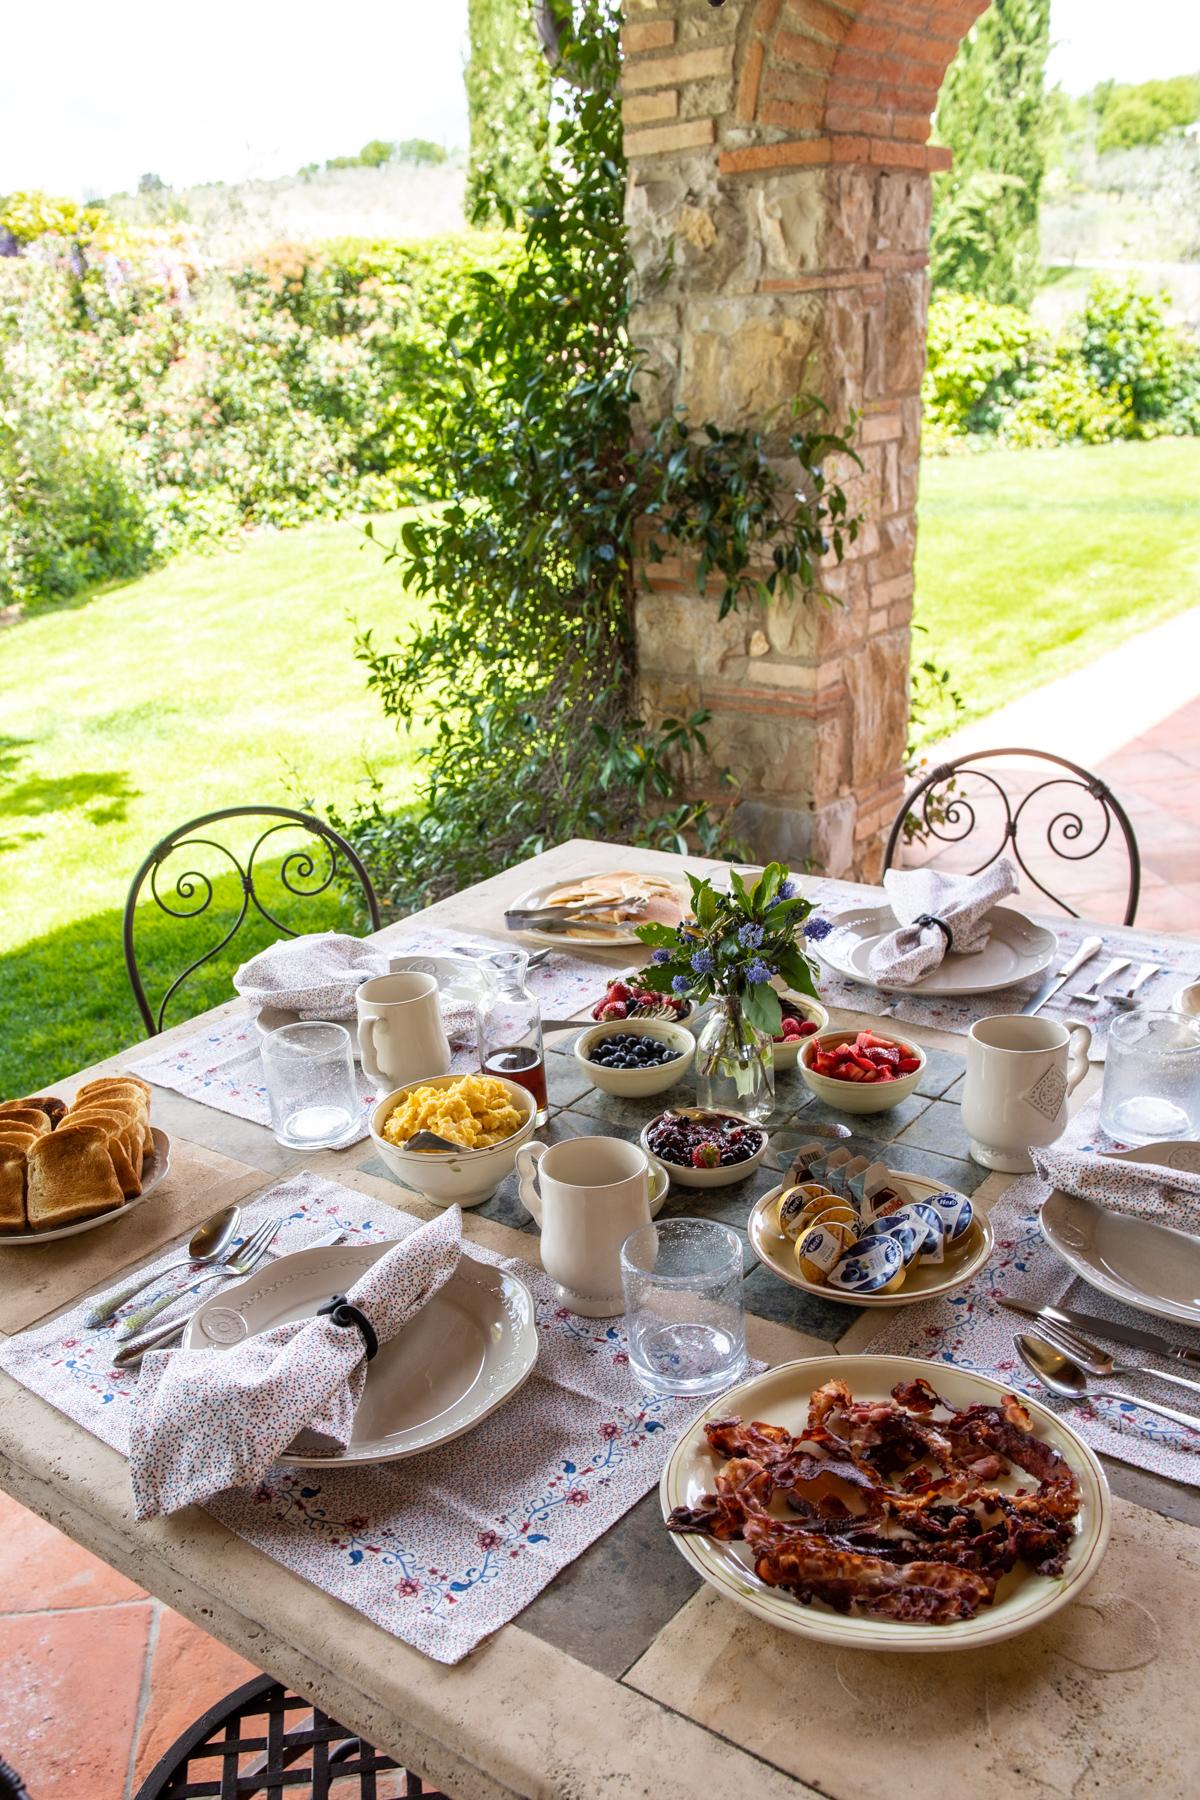 Stacie Flinner x Cuvee Tuscan Farmhouse Villa Tuscany Italy Guide-3.jpg